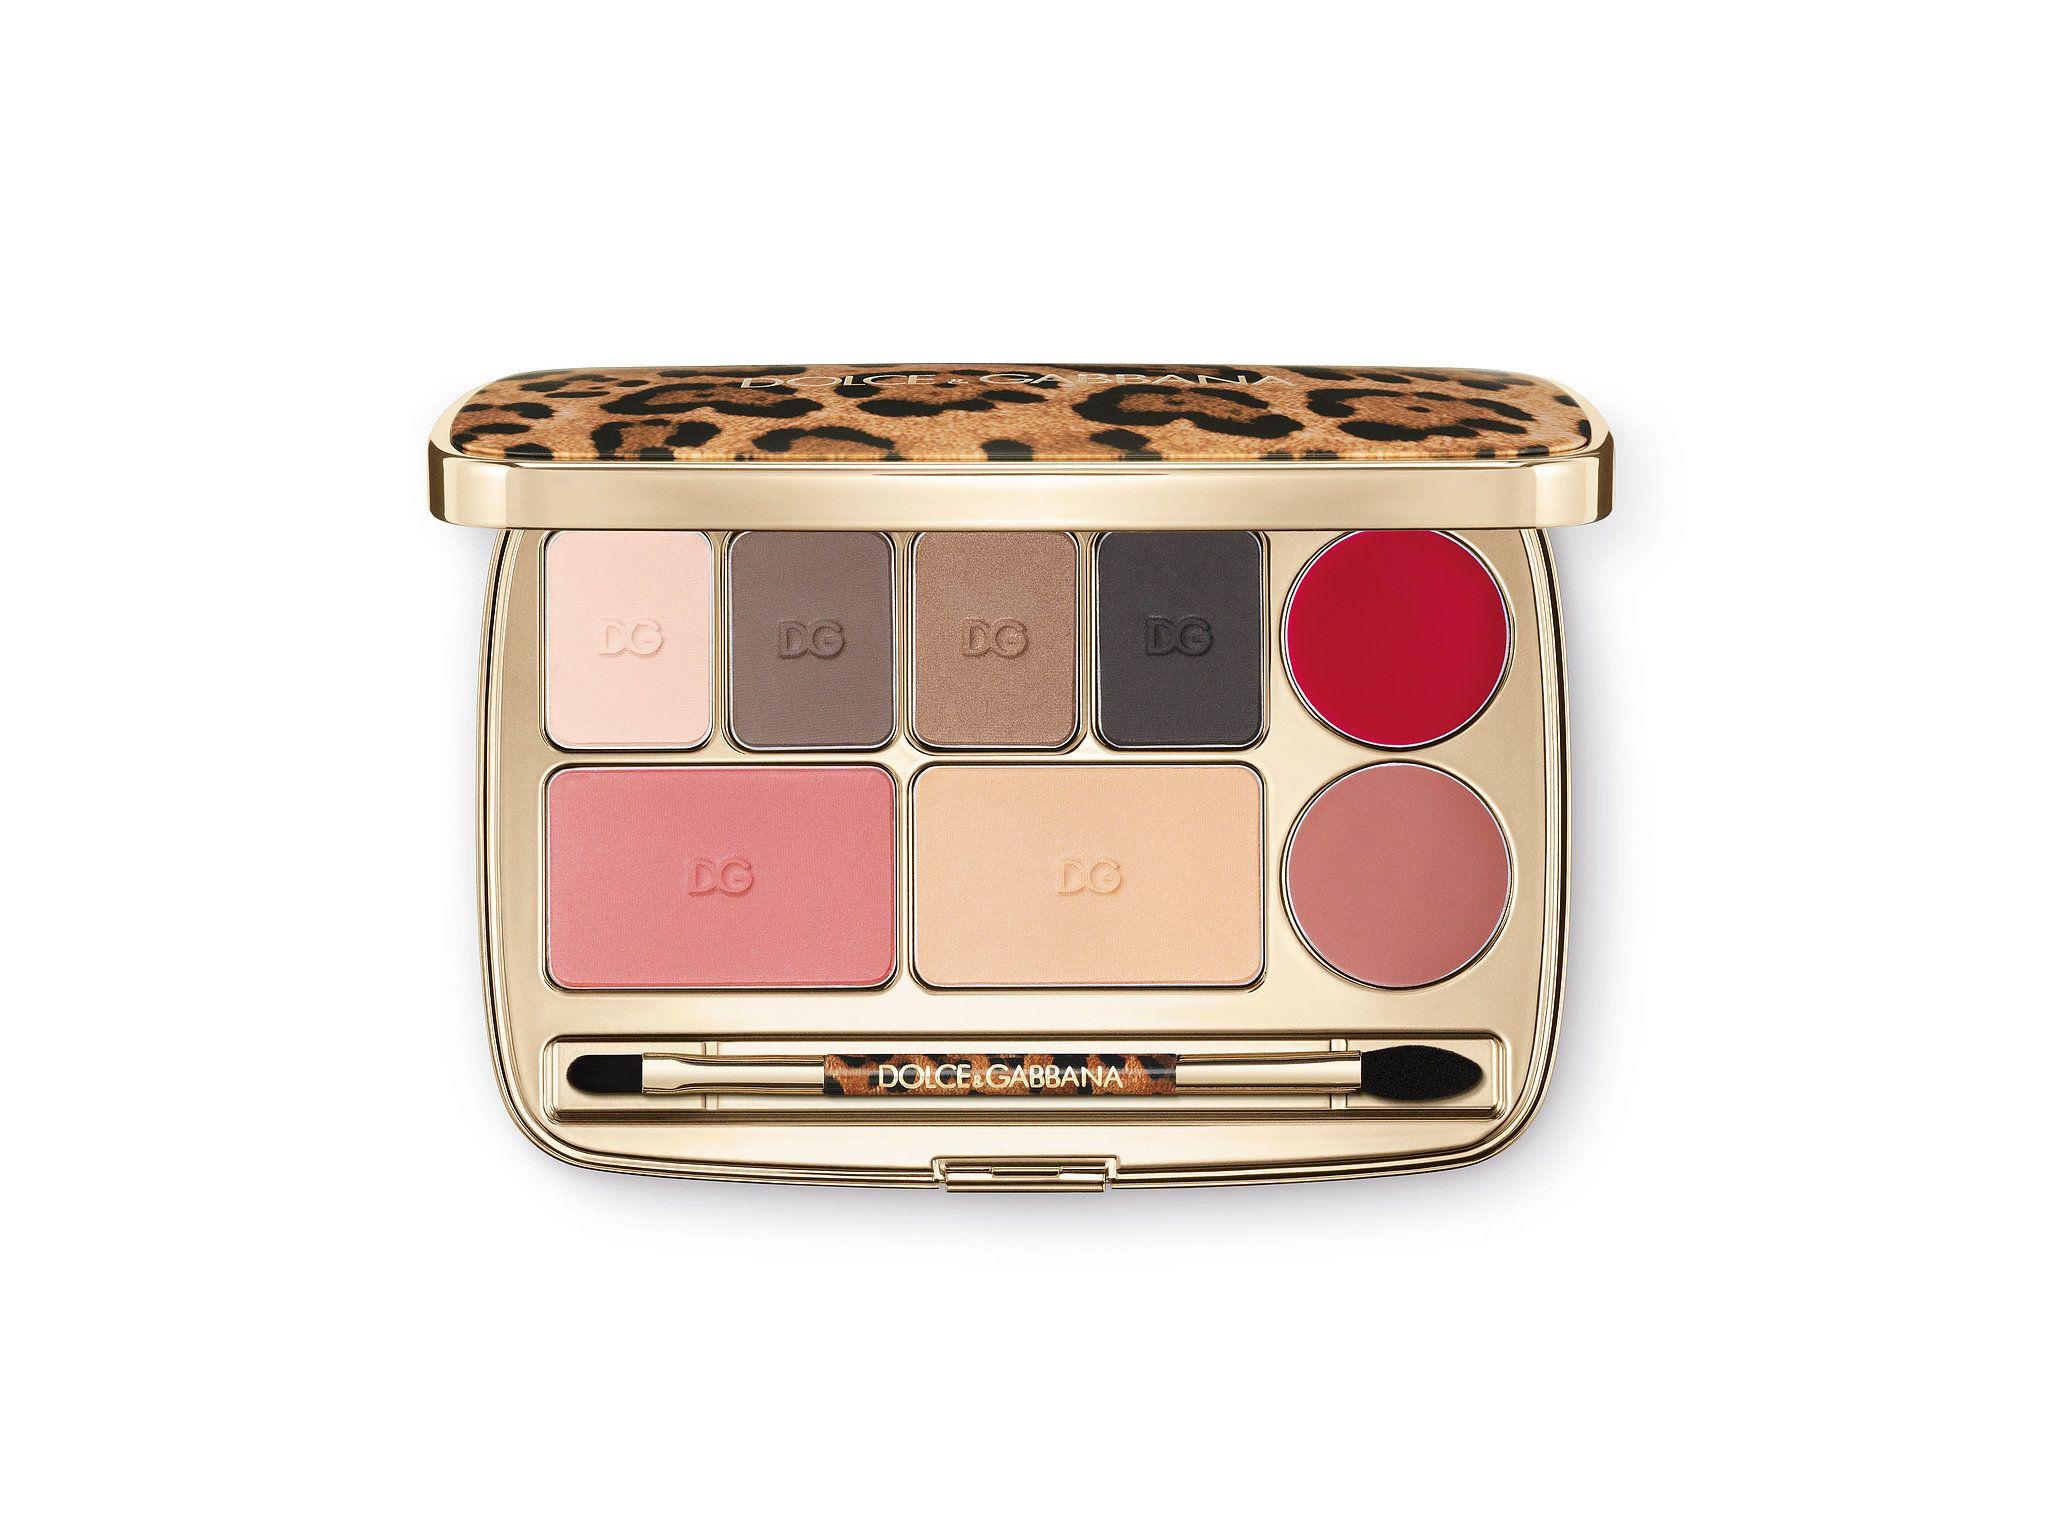 Dolce & Gabbana Beauty Voyage Makeup Essential Palette